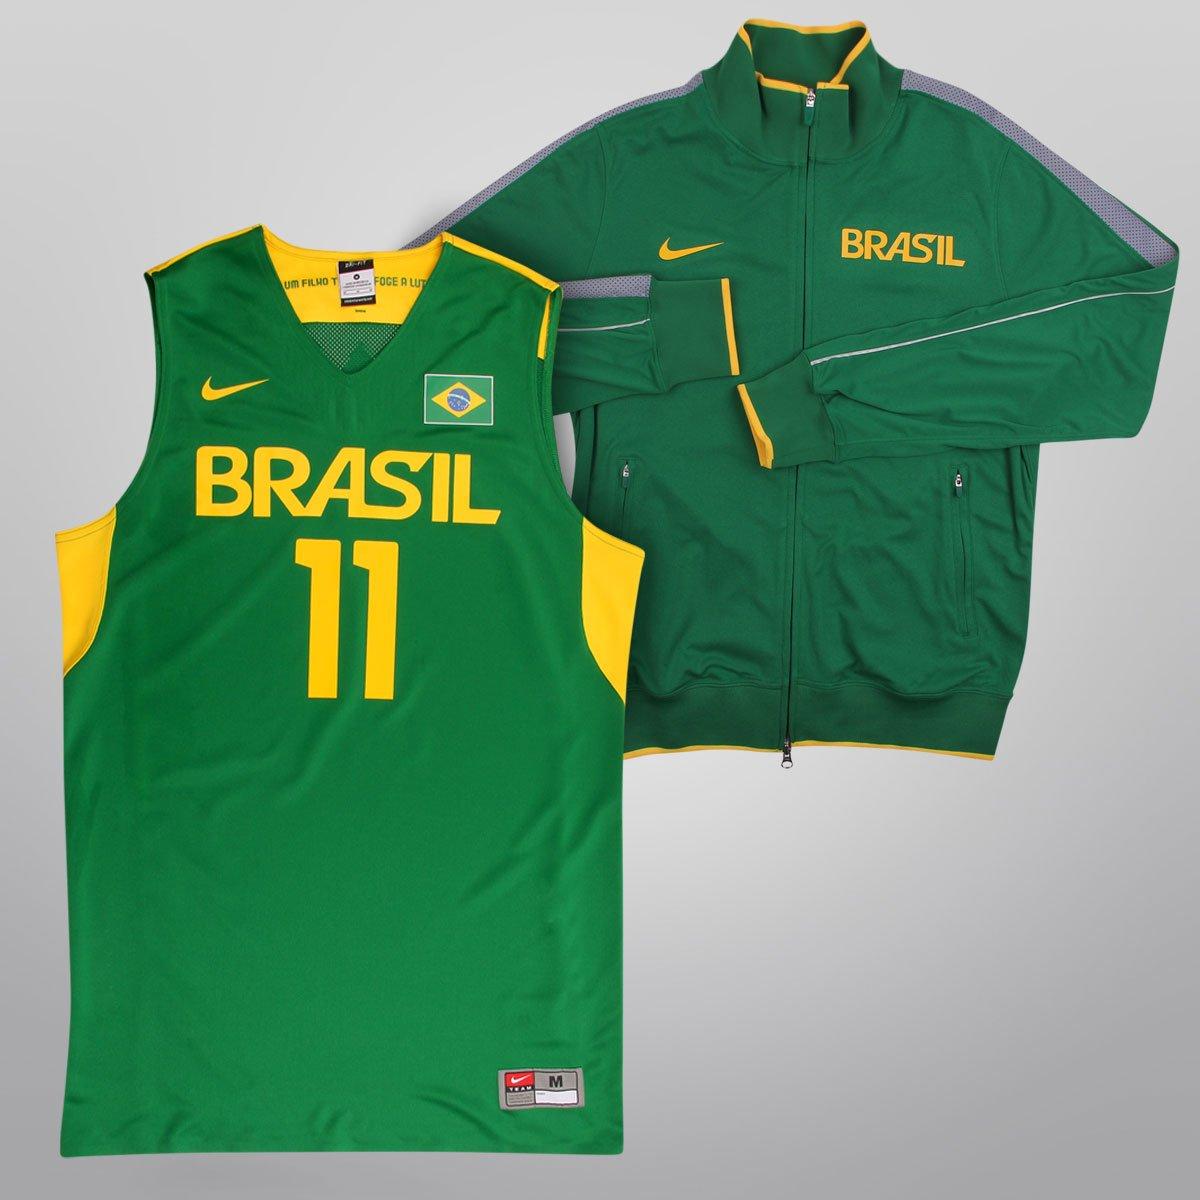 f93ac6332c Kit Nike Brasil - Camiseta Regata Jogador Seleção Brasil Basquete + Jaqueta  London PF N98 Brasil - Compre Agora